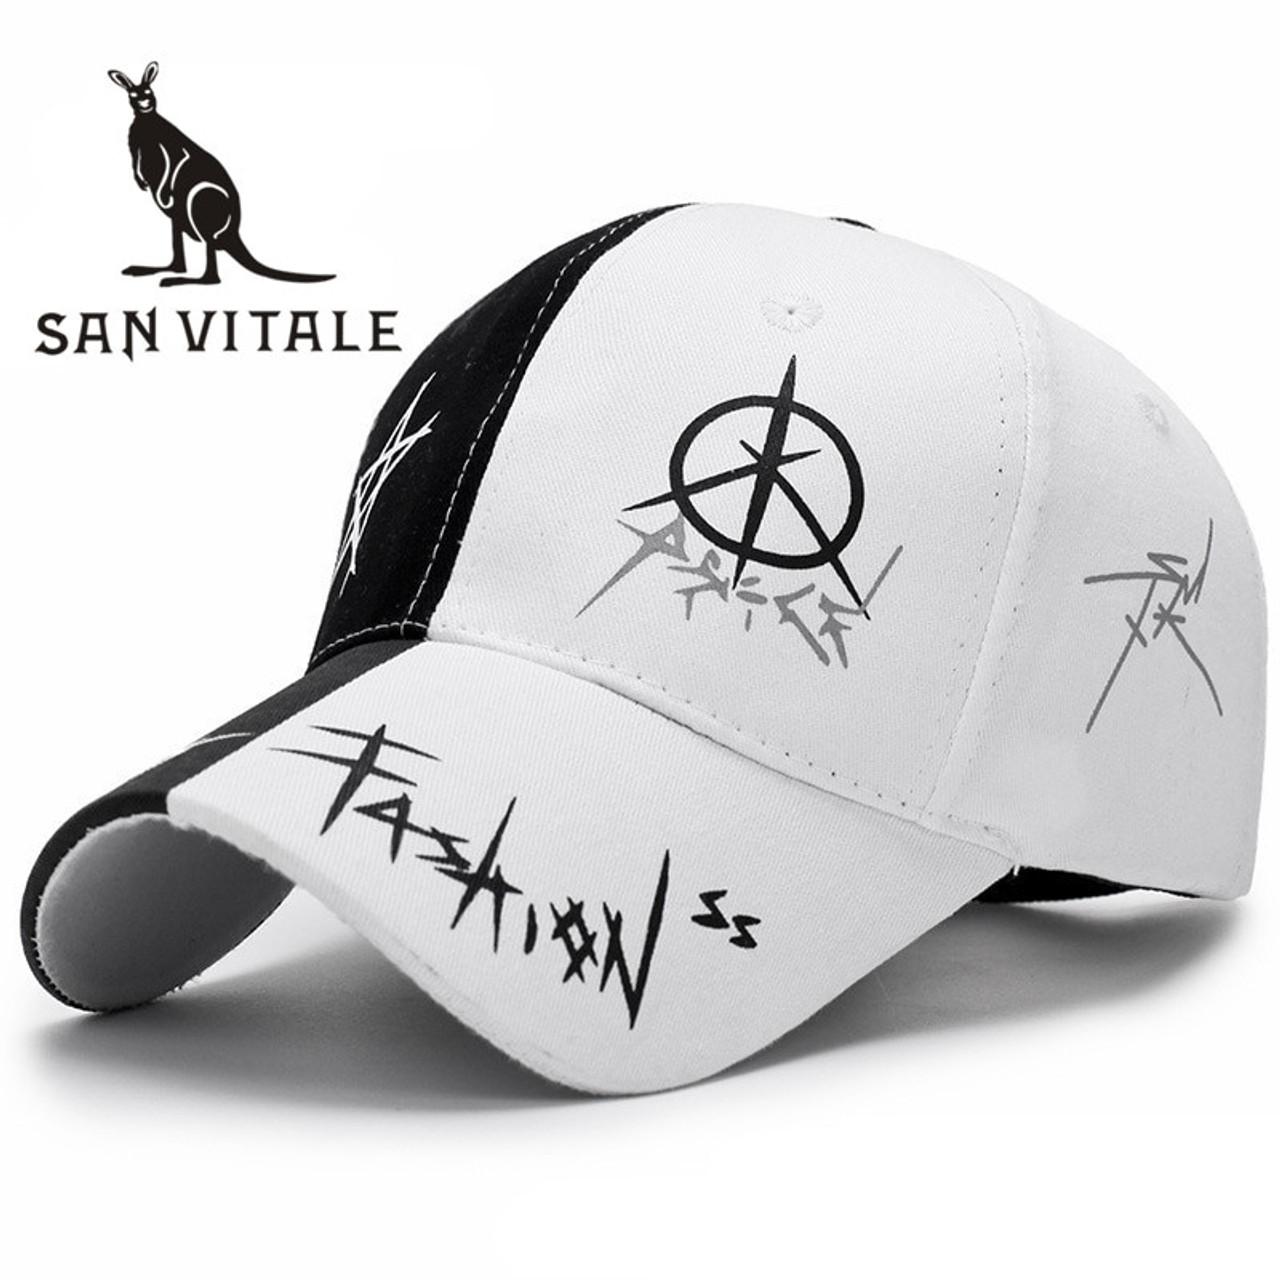 4f32877ded8 Baseball Cap Mens Hat Spring Bones Masculino Hats Summer Snapback Chance  The Rapper Man Black Luxury ...